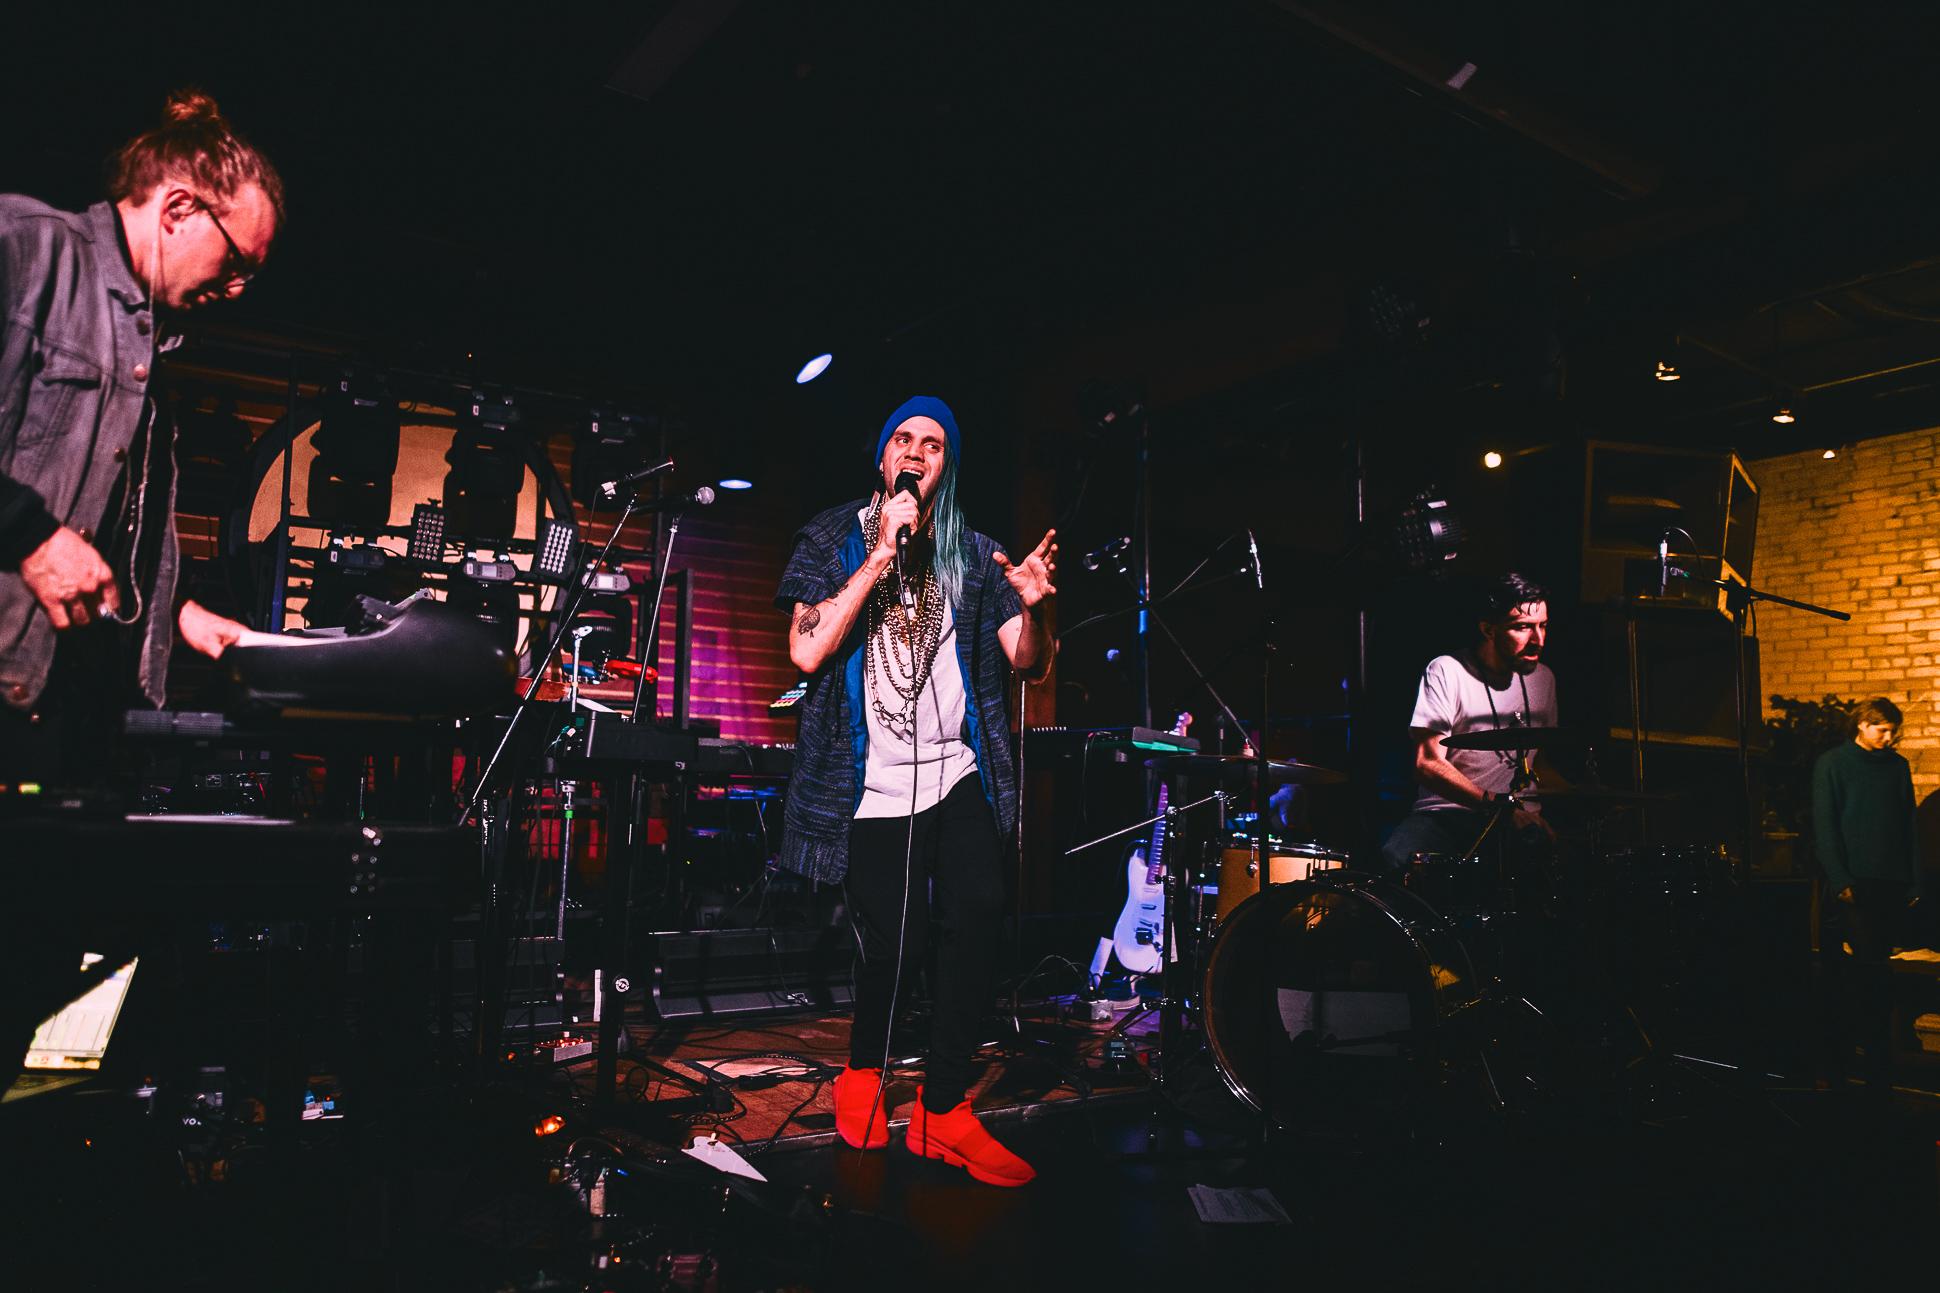 YoungAndSick-FortuneSoundClub-24-01-2019-Vancouver-07.jpg